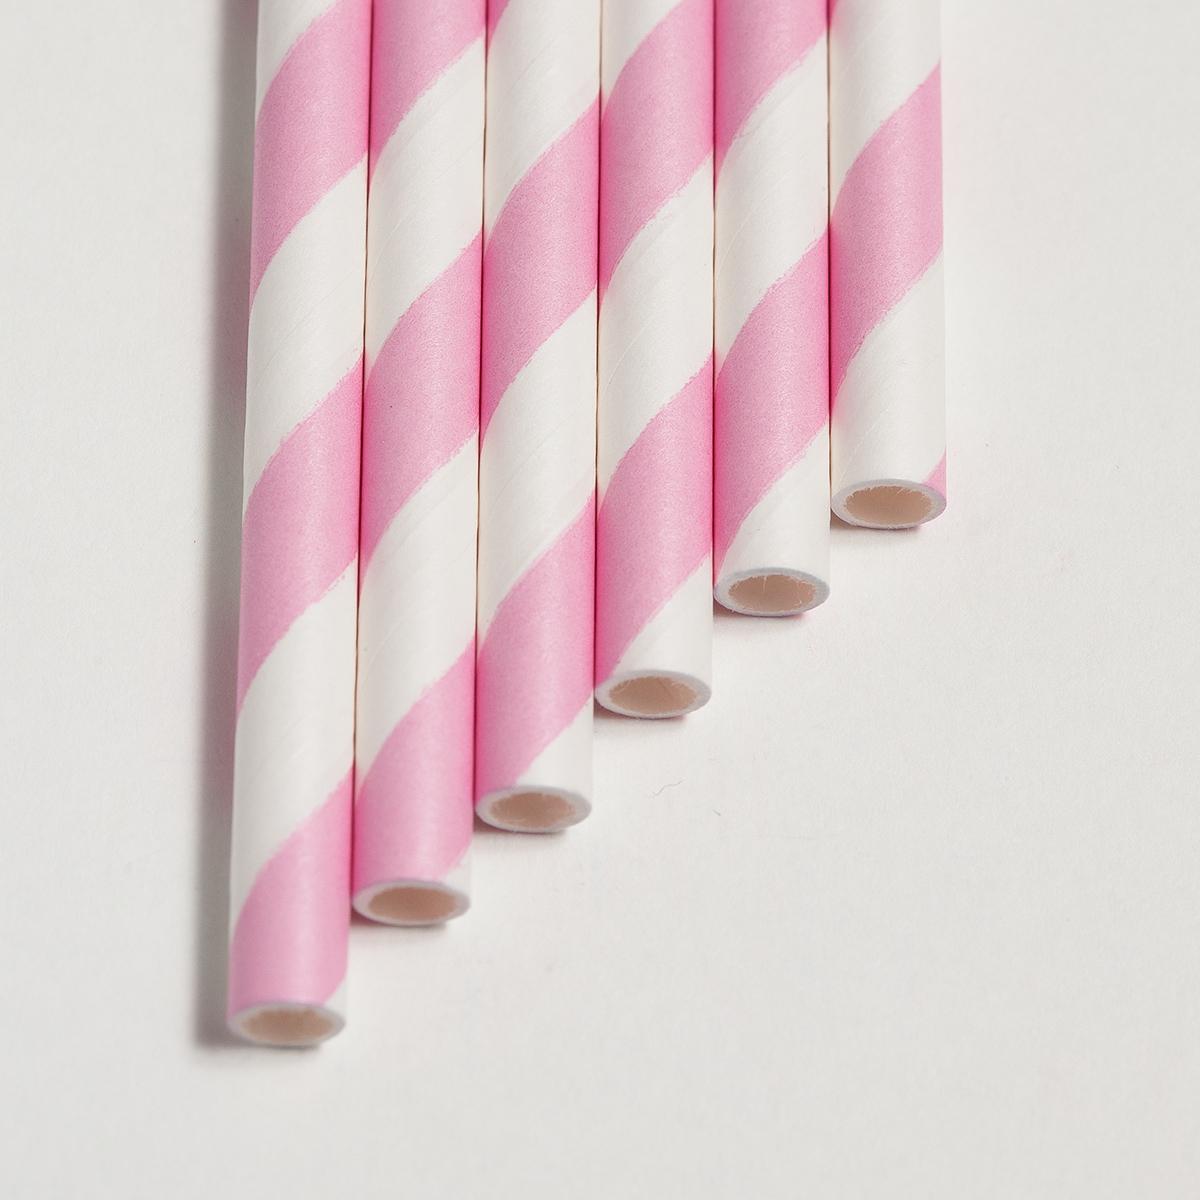 Soft-Pink-Lined0003.jpg